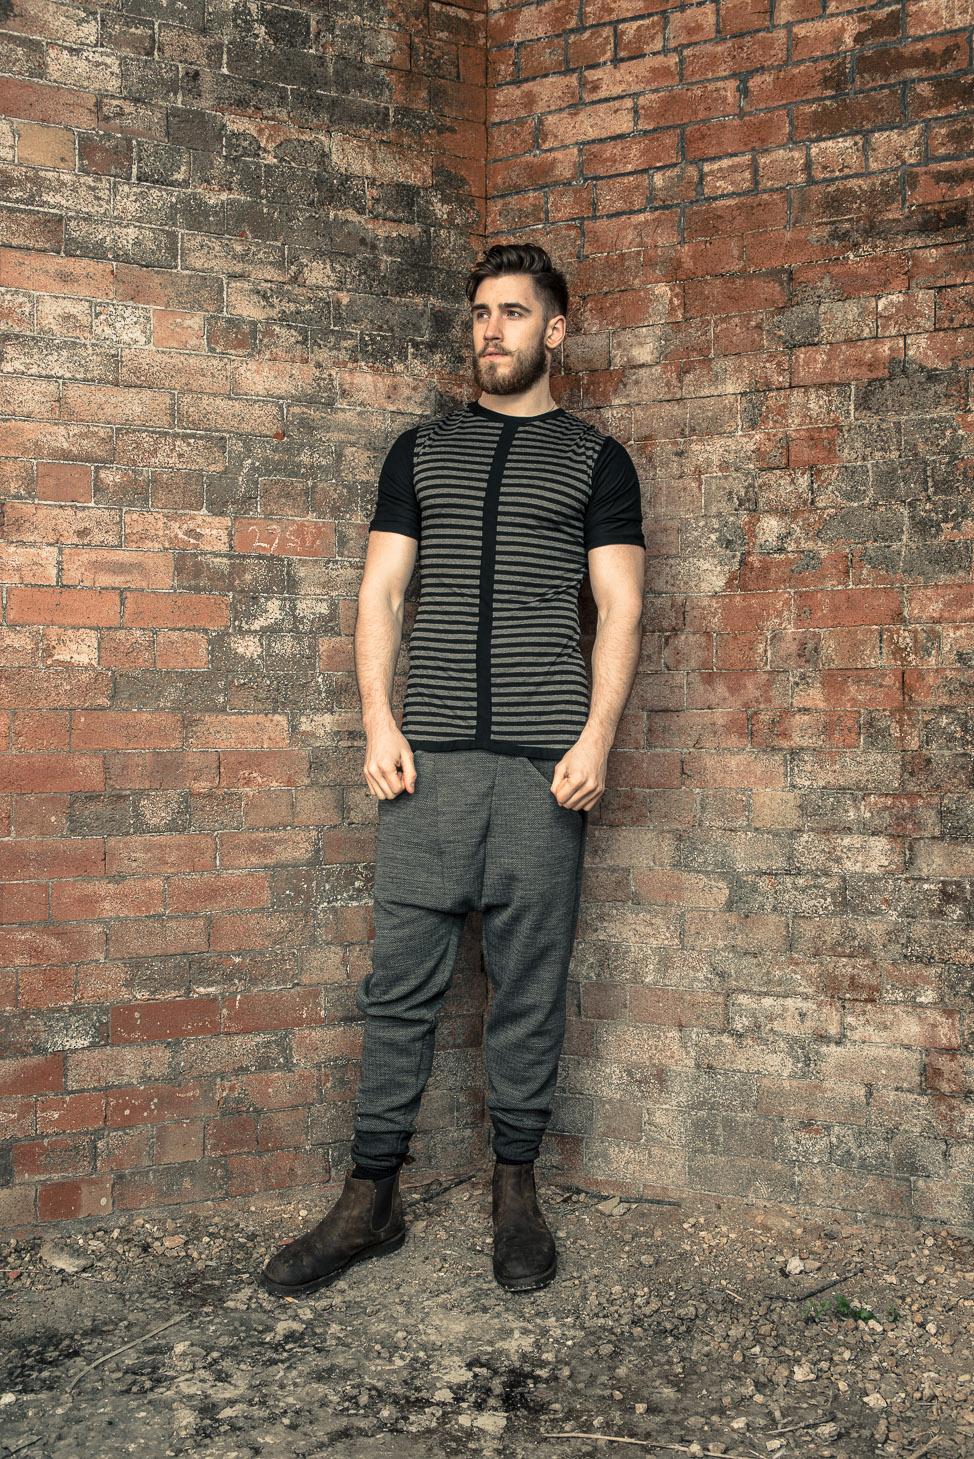 zaramia-ava-zaramiaava-leeds-fashion-designer-ethical-sustainable-tailored-minimalist-fitted-versatile-drape-koji-grey-tshirt-top-hareem-trousers-black-grey-texture-styling-menswear-model-25